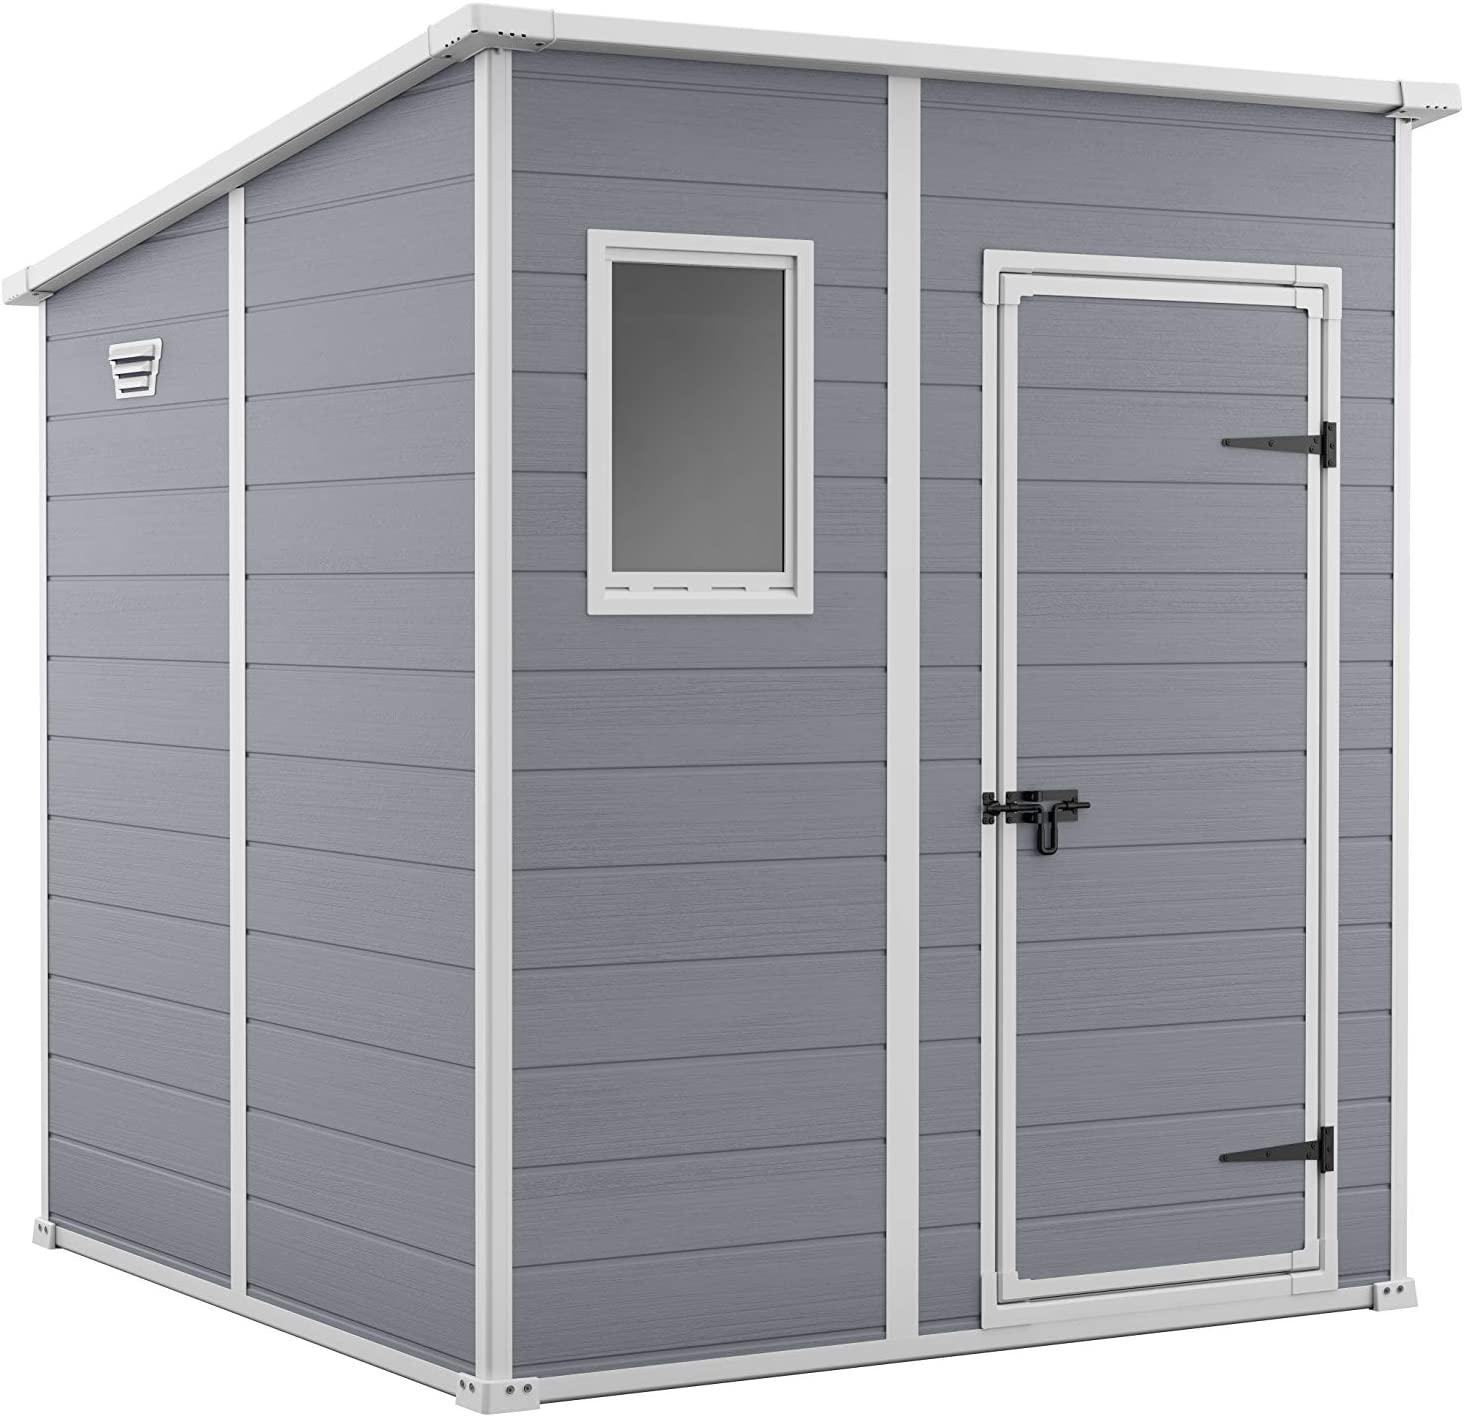 Keter 242787 - Caseta de jardín exterior Manor 6x6, Color gris